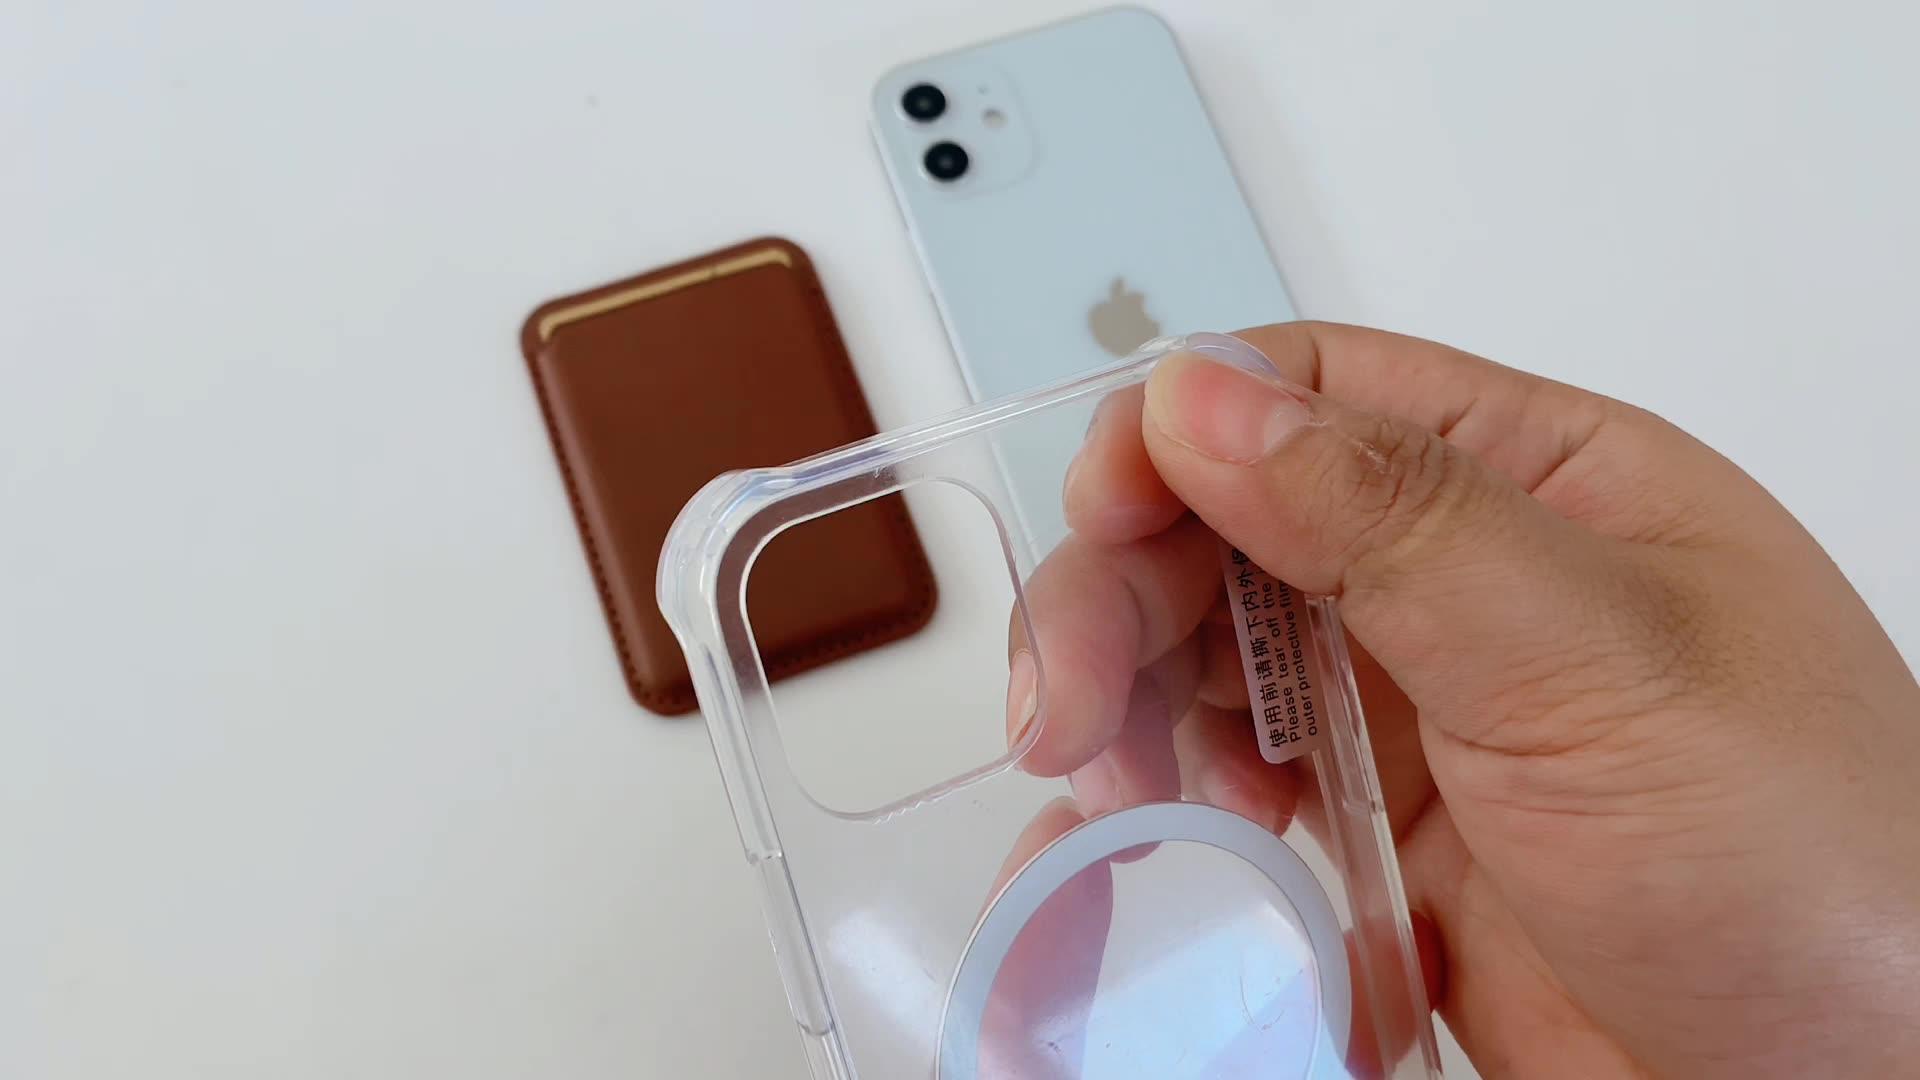 Magnetische Abnehmbare Brieftasche Telefon Fall Transparent Für iPhone 12 Pro Fall